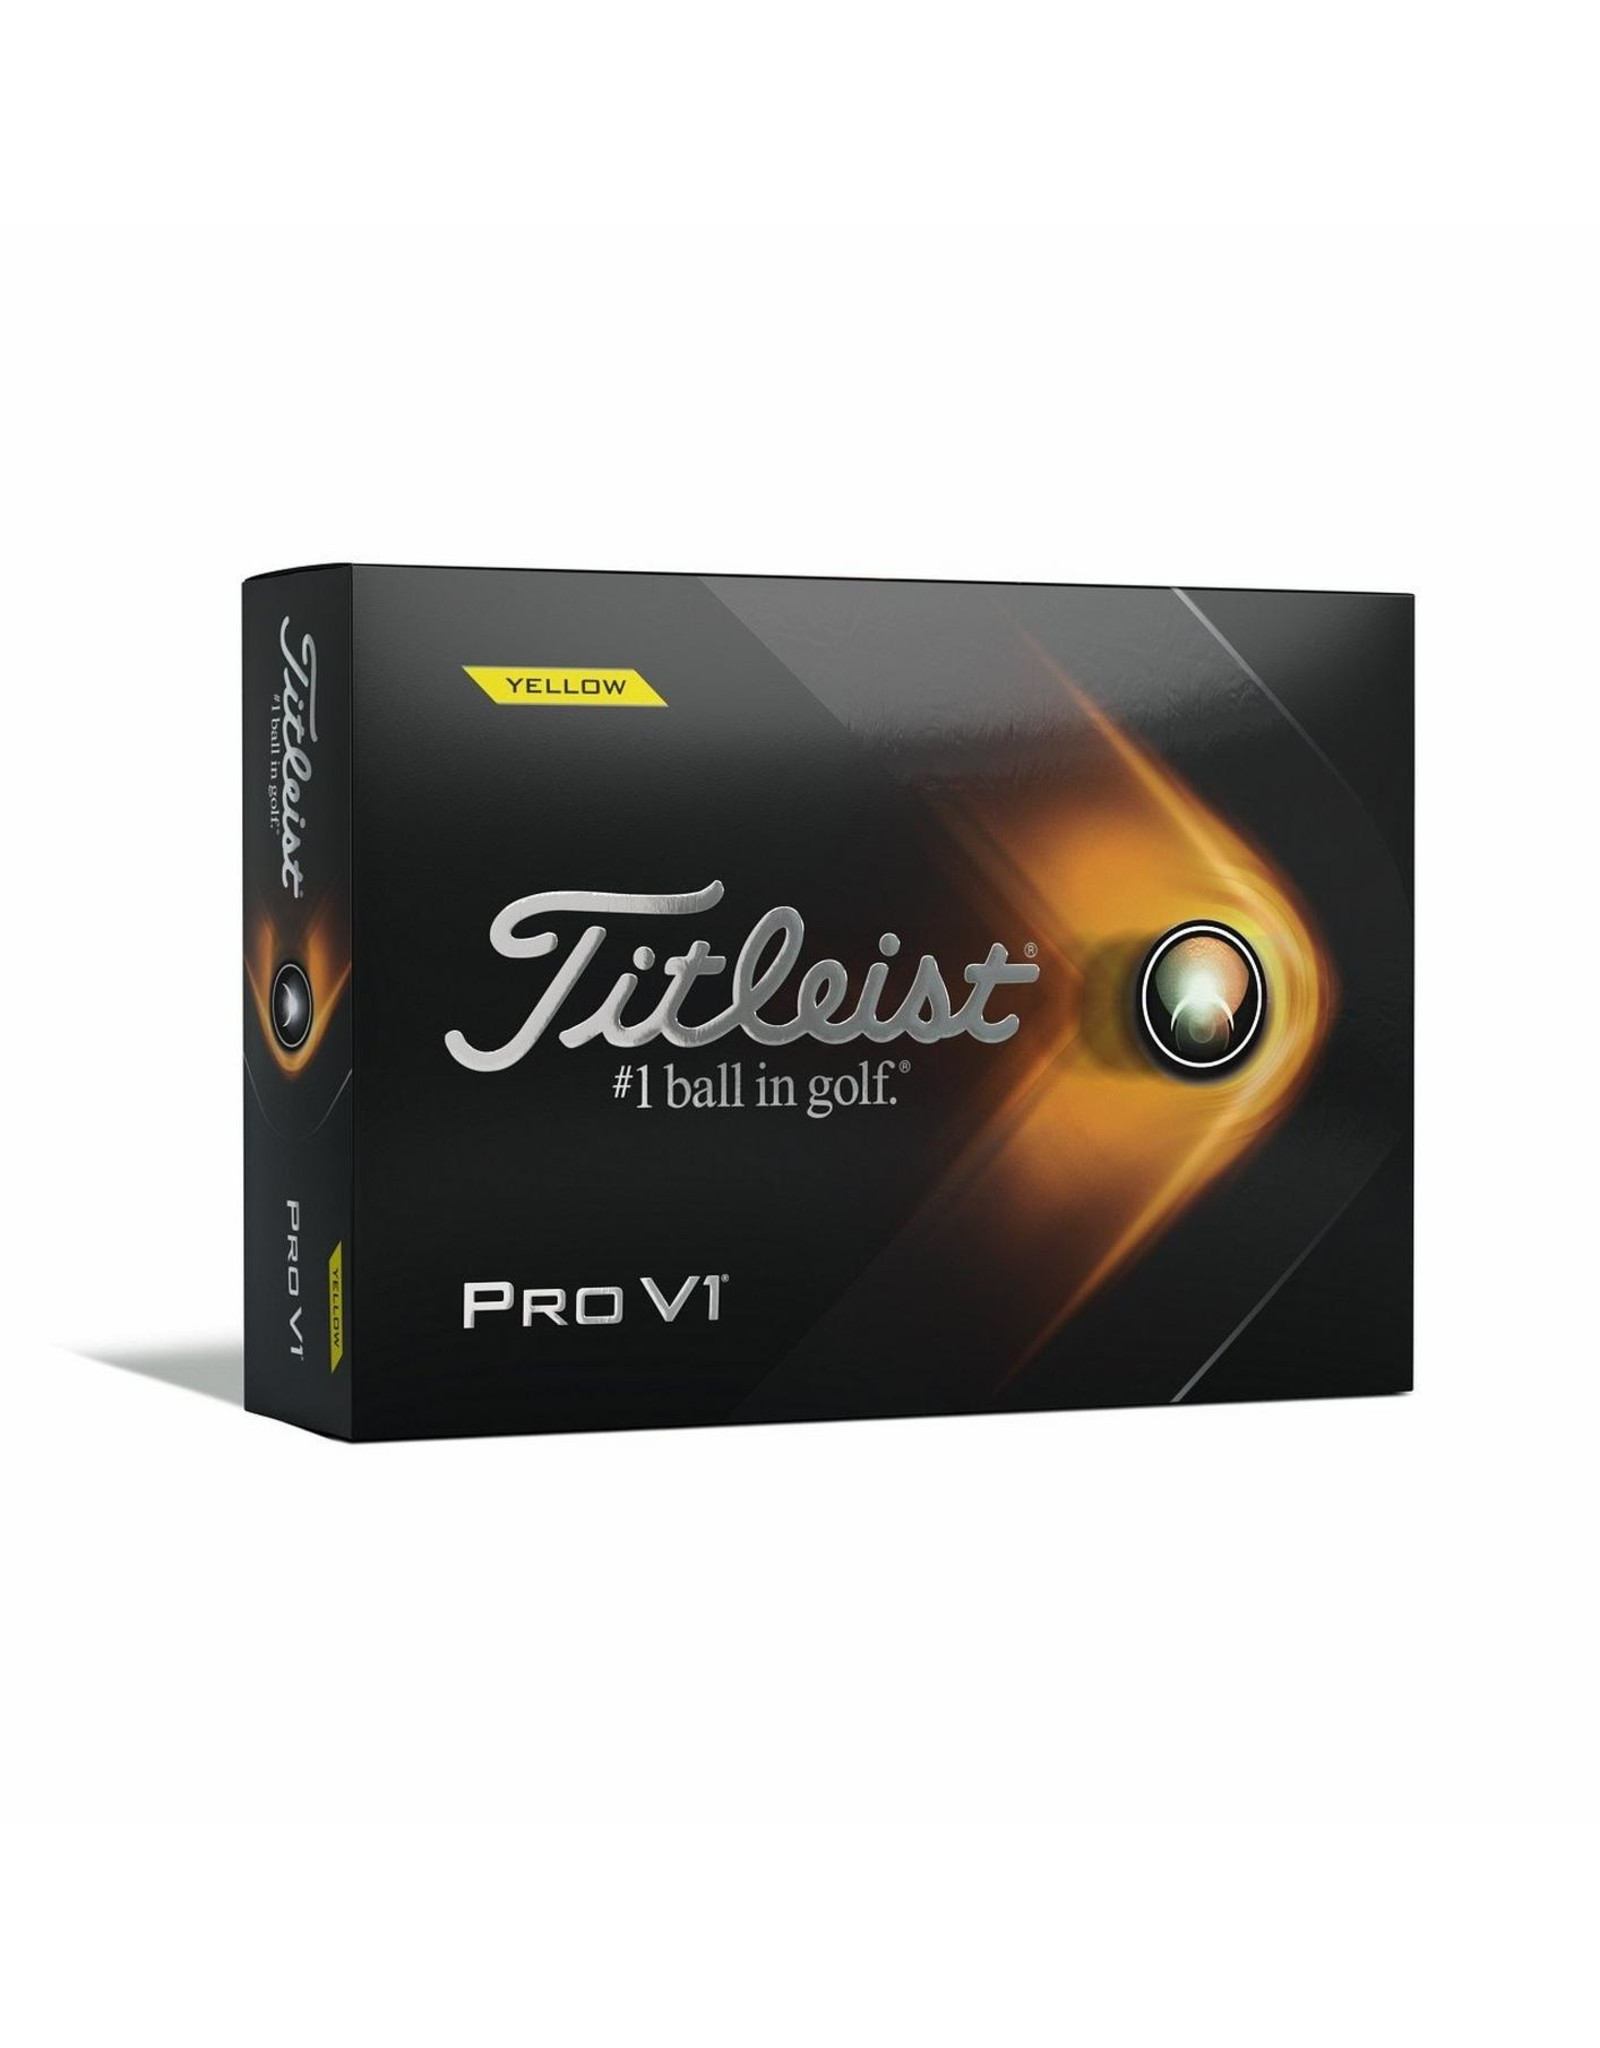 Titleist Titleist Pro V1 Yellow Dozen